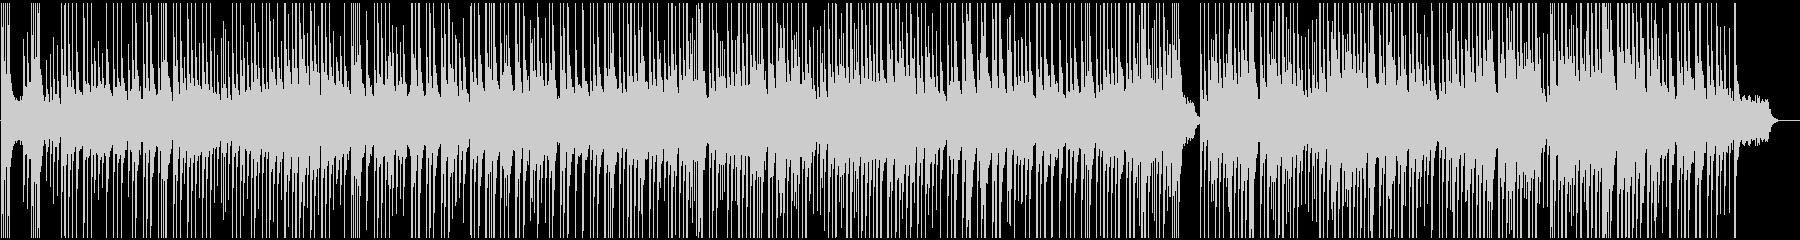 BGM reminiscent of a sad farewell's unreproduced waveform